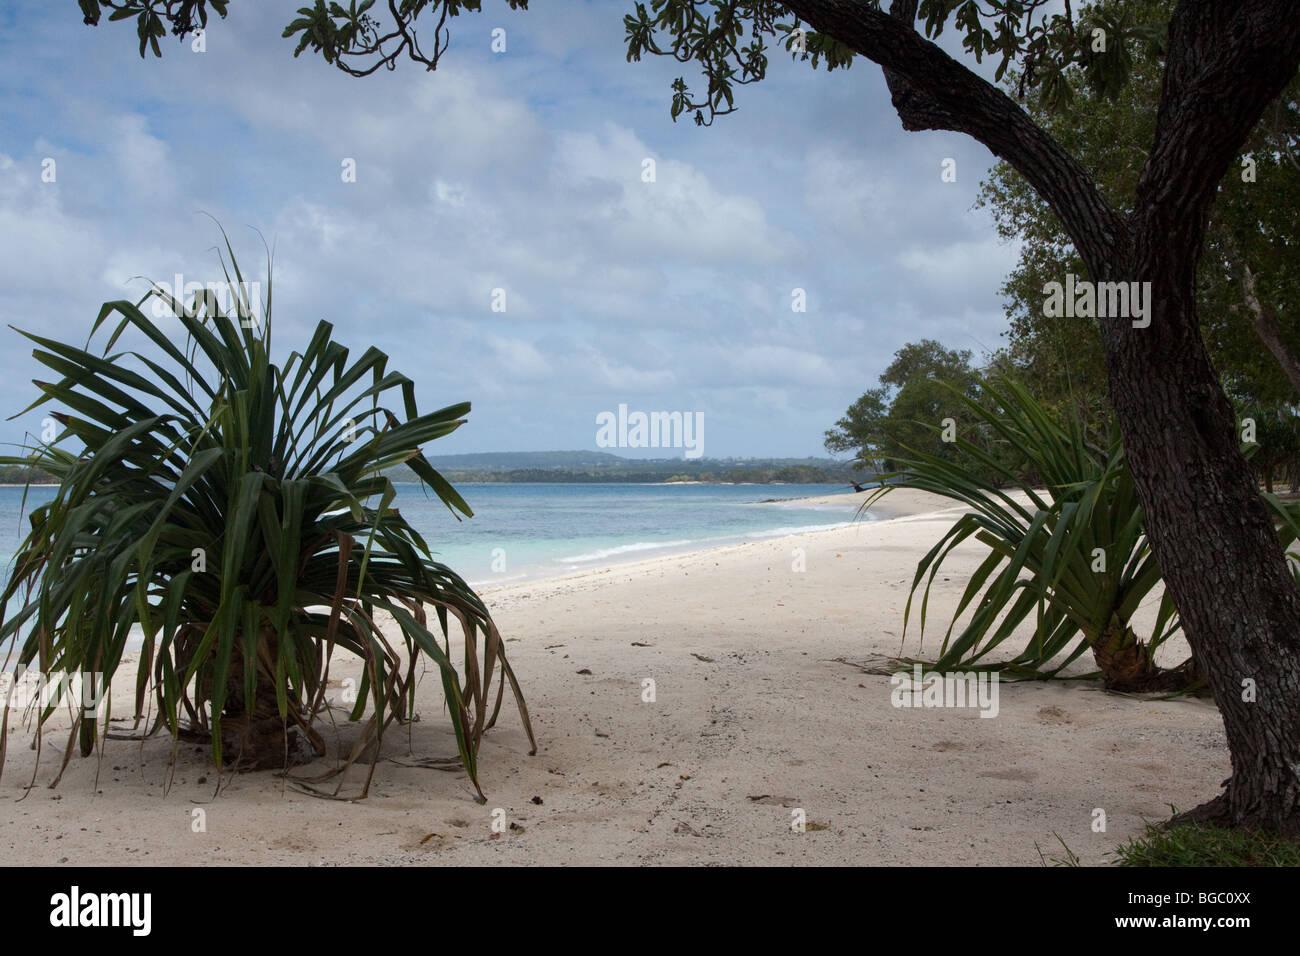 Vanuatu Beachfront - Stock Image